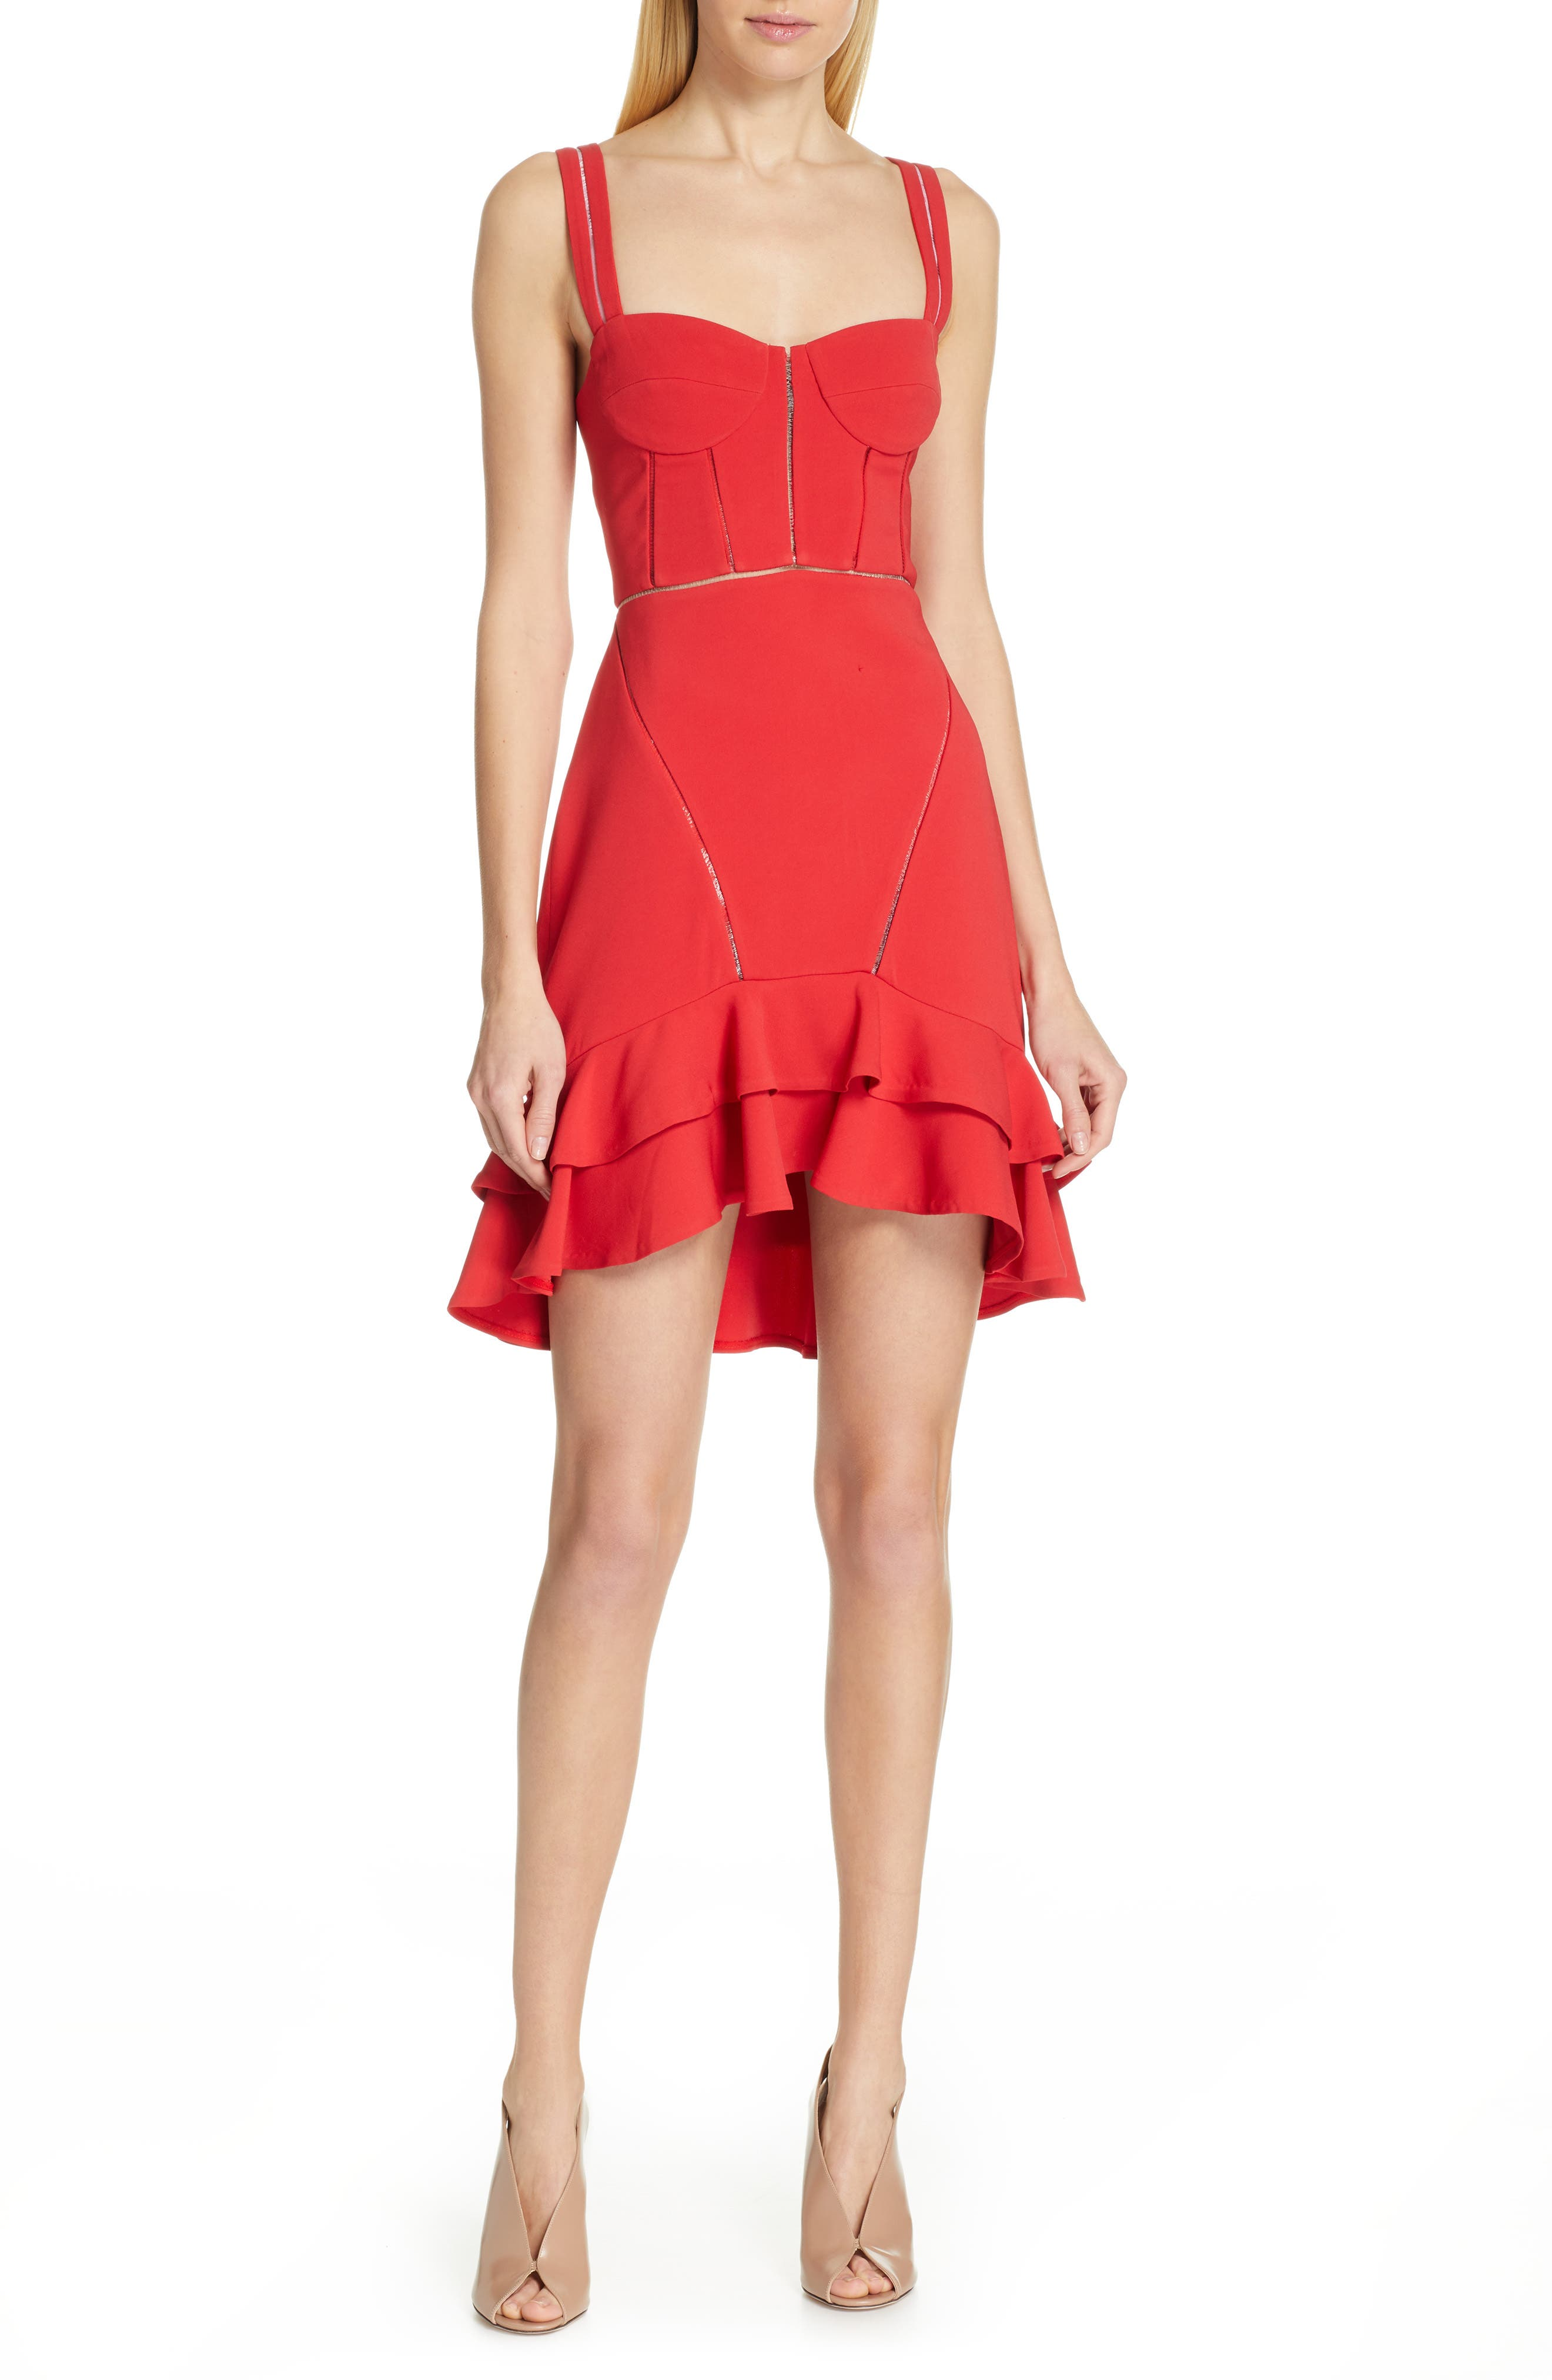 Crepe Combo Mini Ruffle A-Line Corset Dress in Fire Red